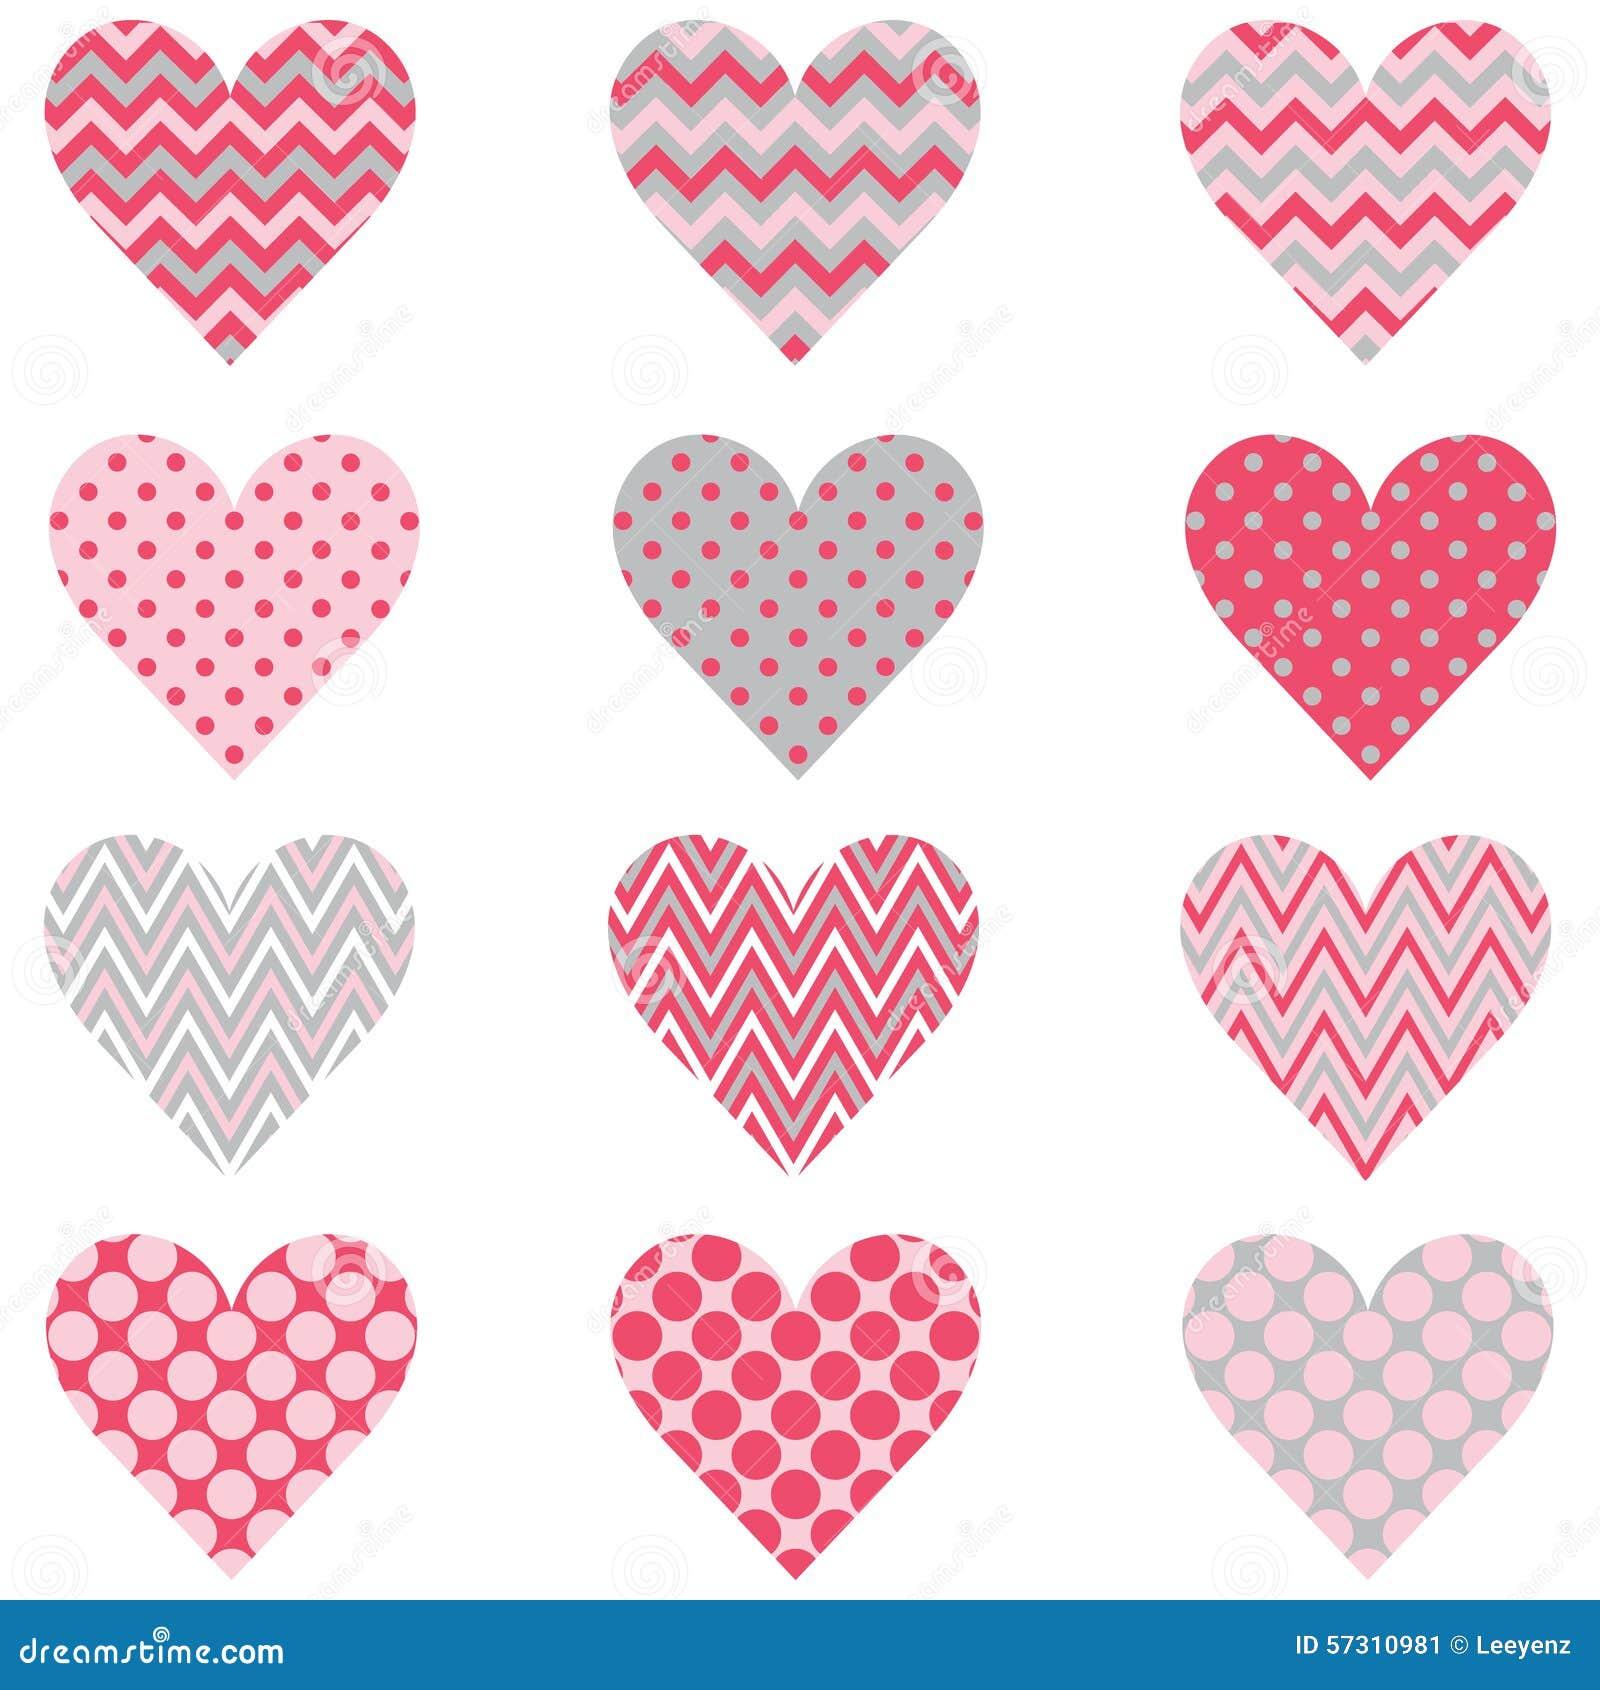 Rosa Chevron-Polka Dot Heart Shape Pattern